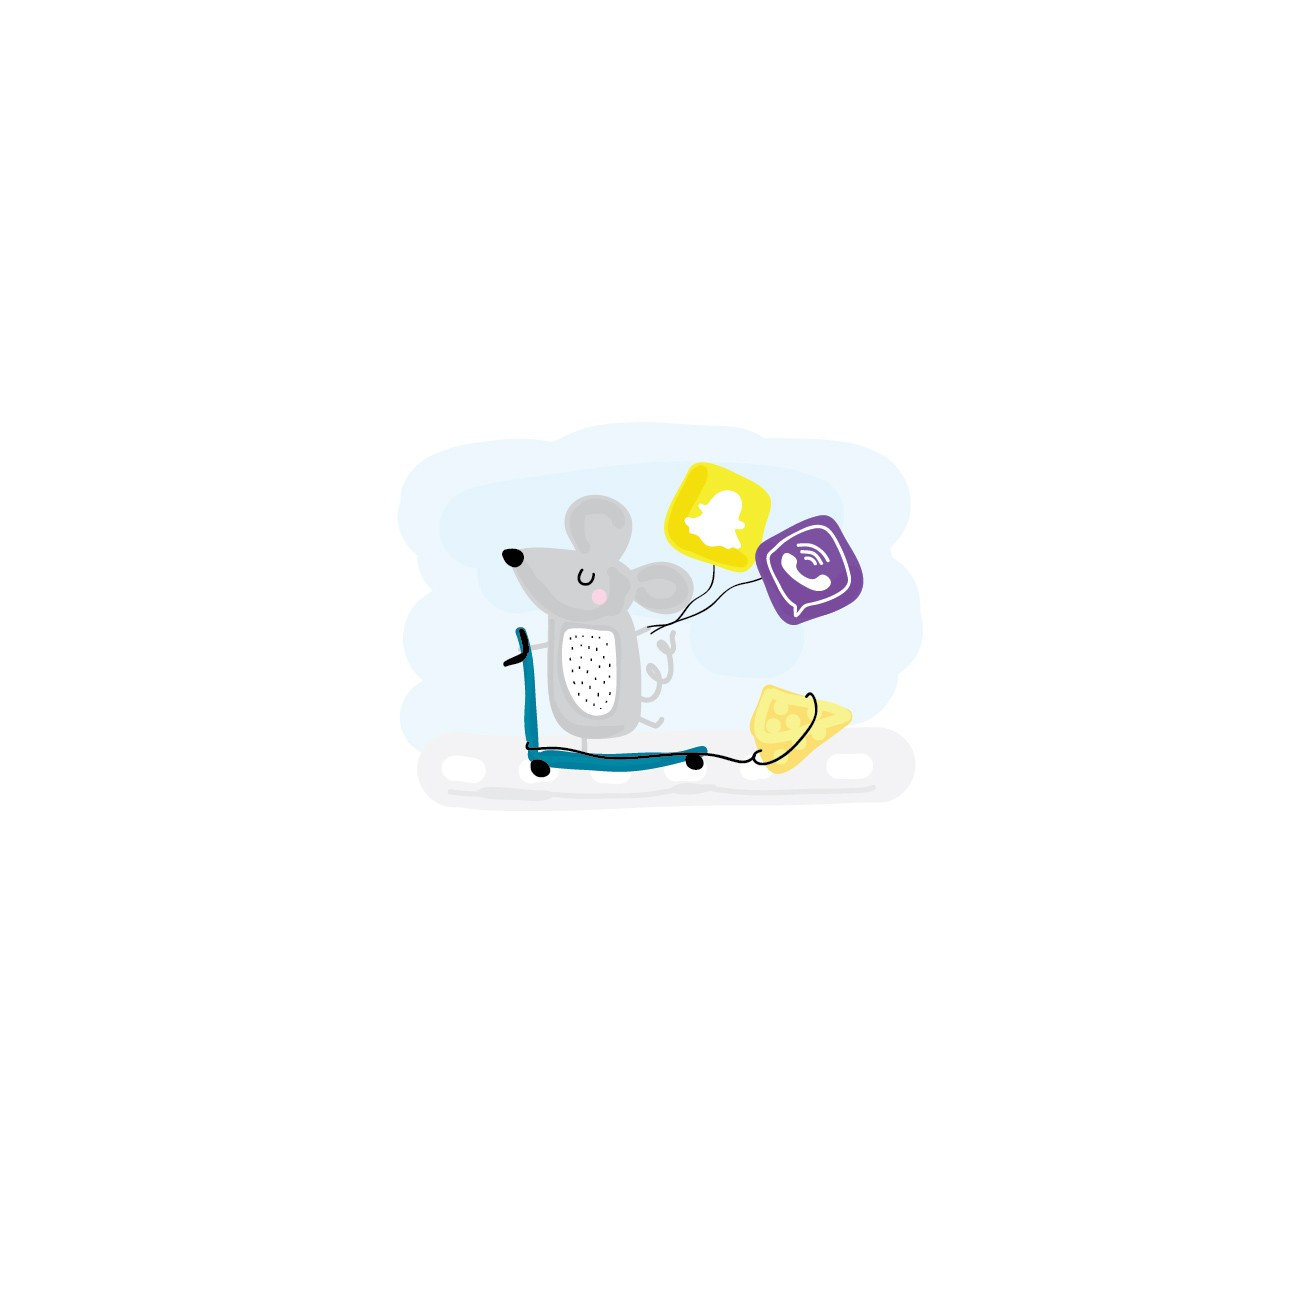 App onboarding screen illustrations